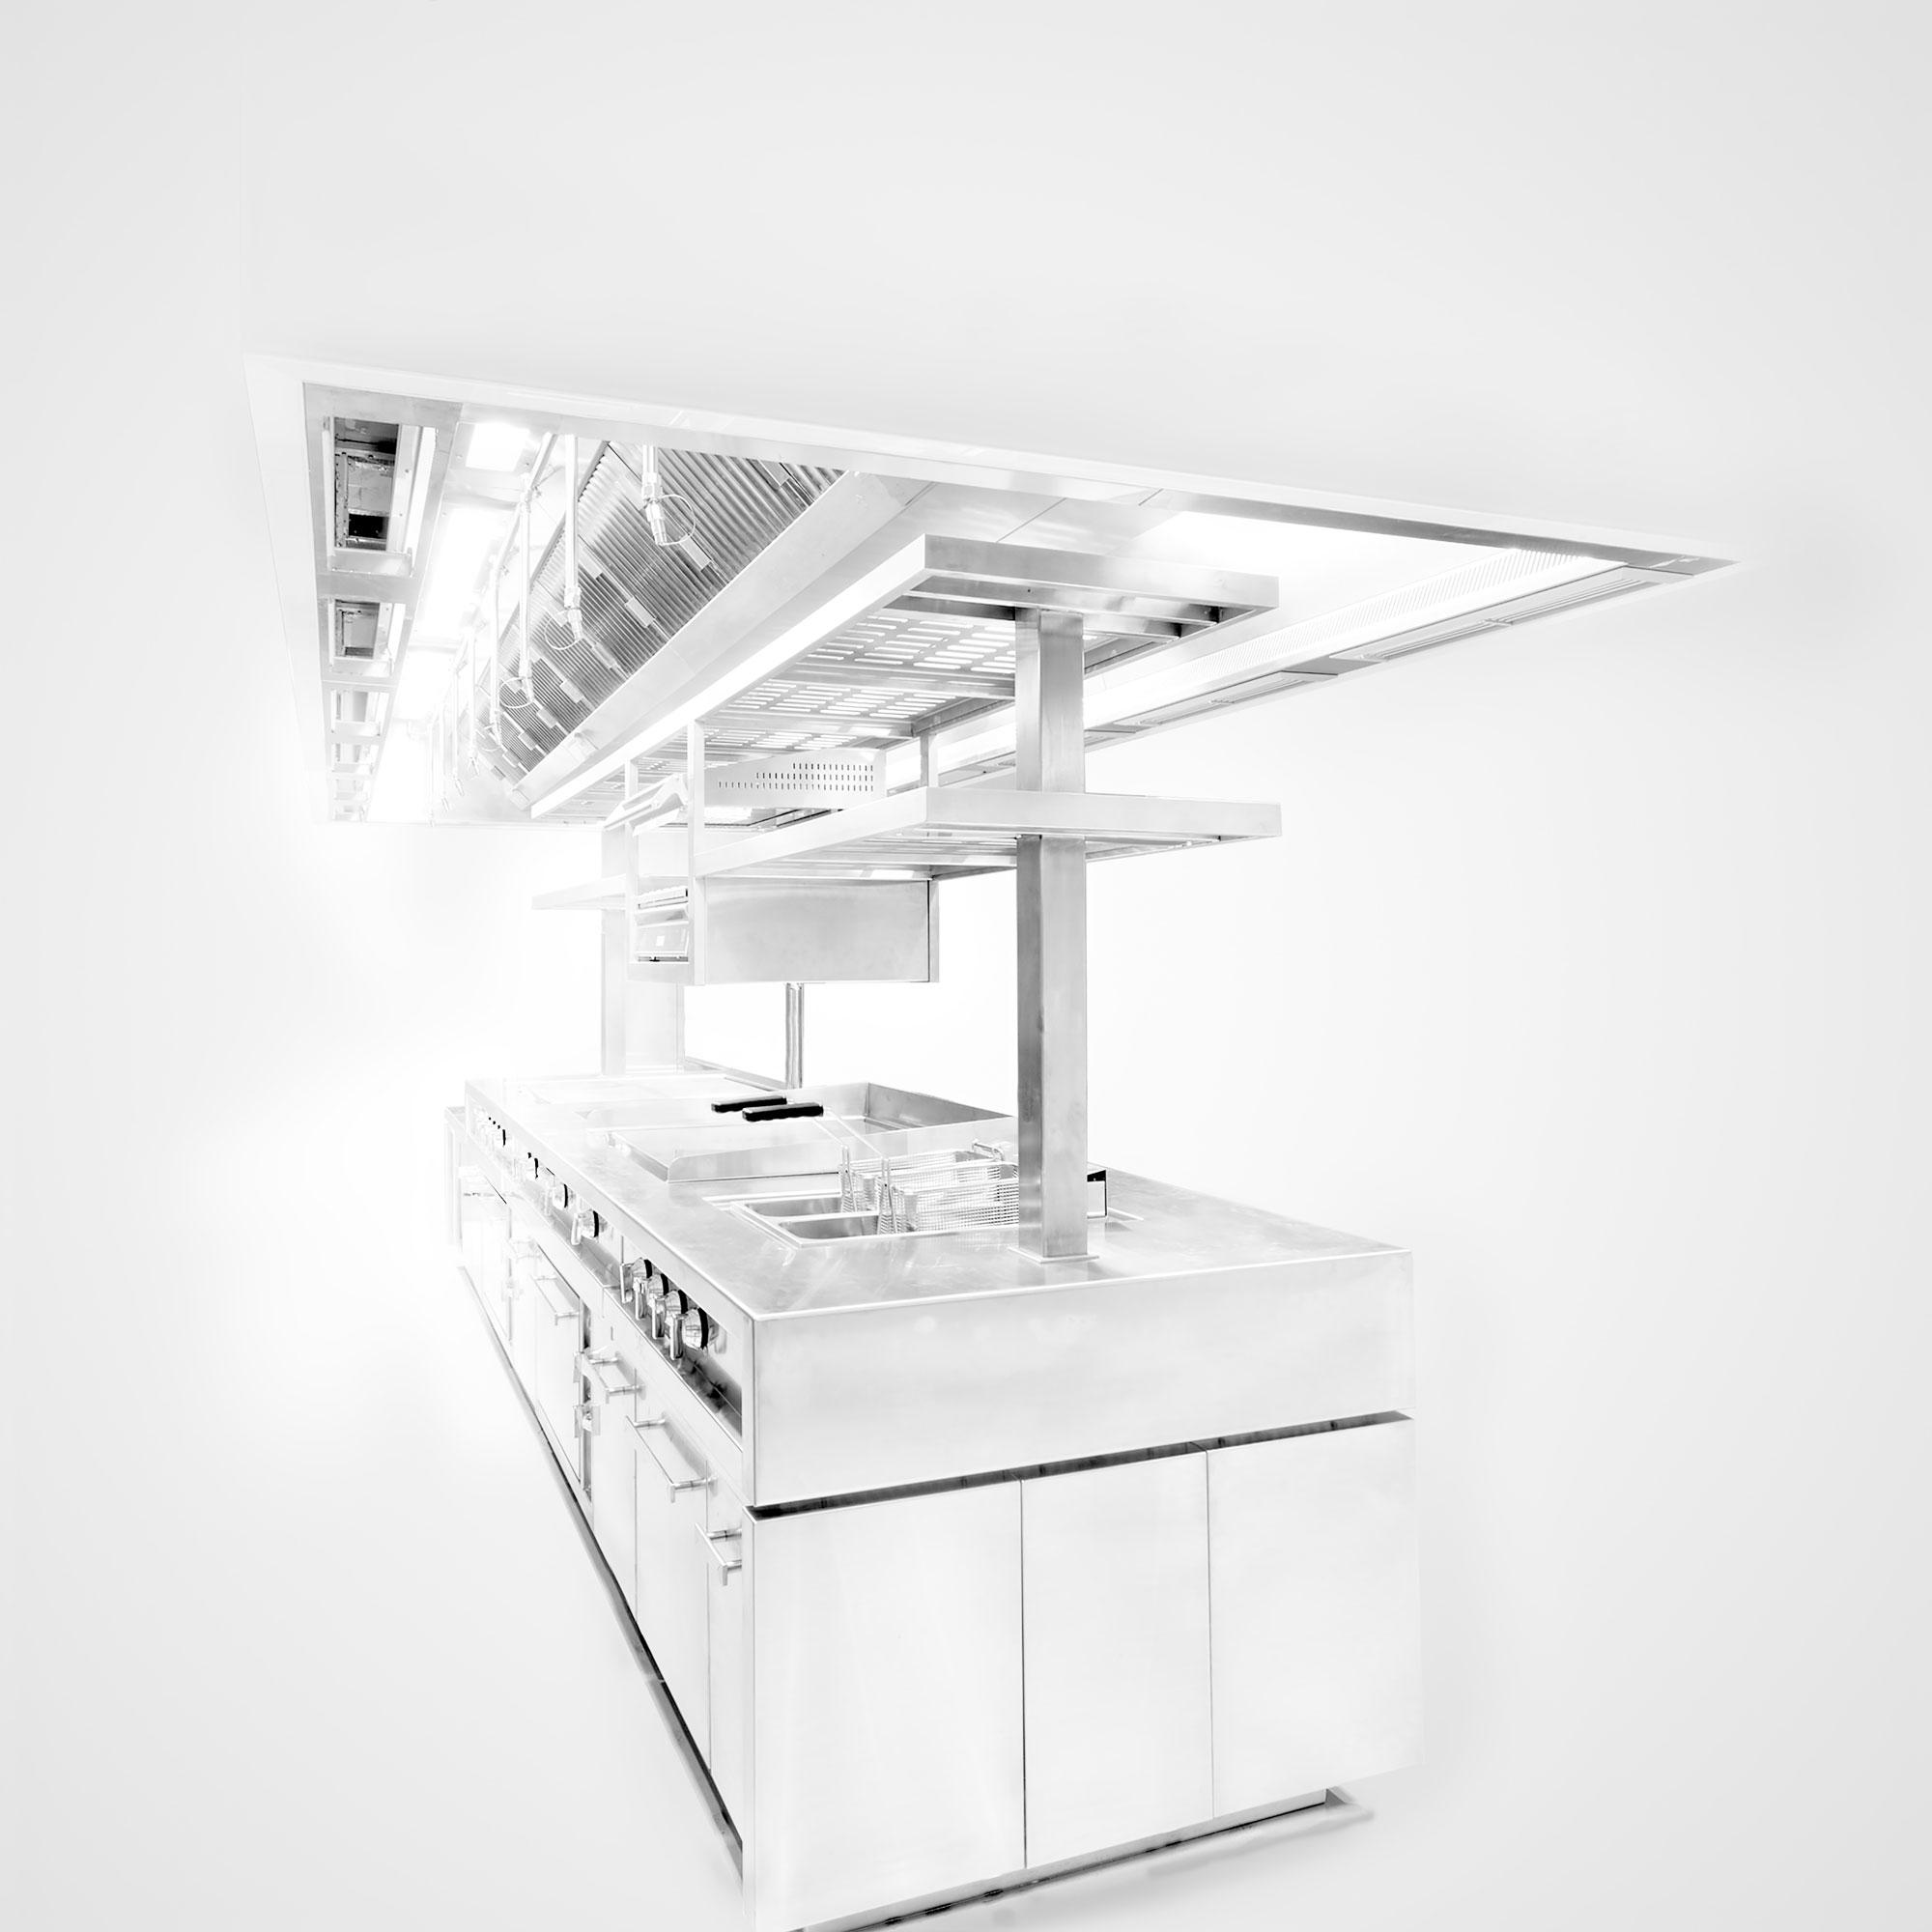 Funky Kitchen Equipment Suppliers In Abu Dhabi Embellishment - Best ...